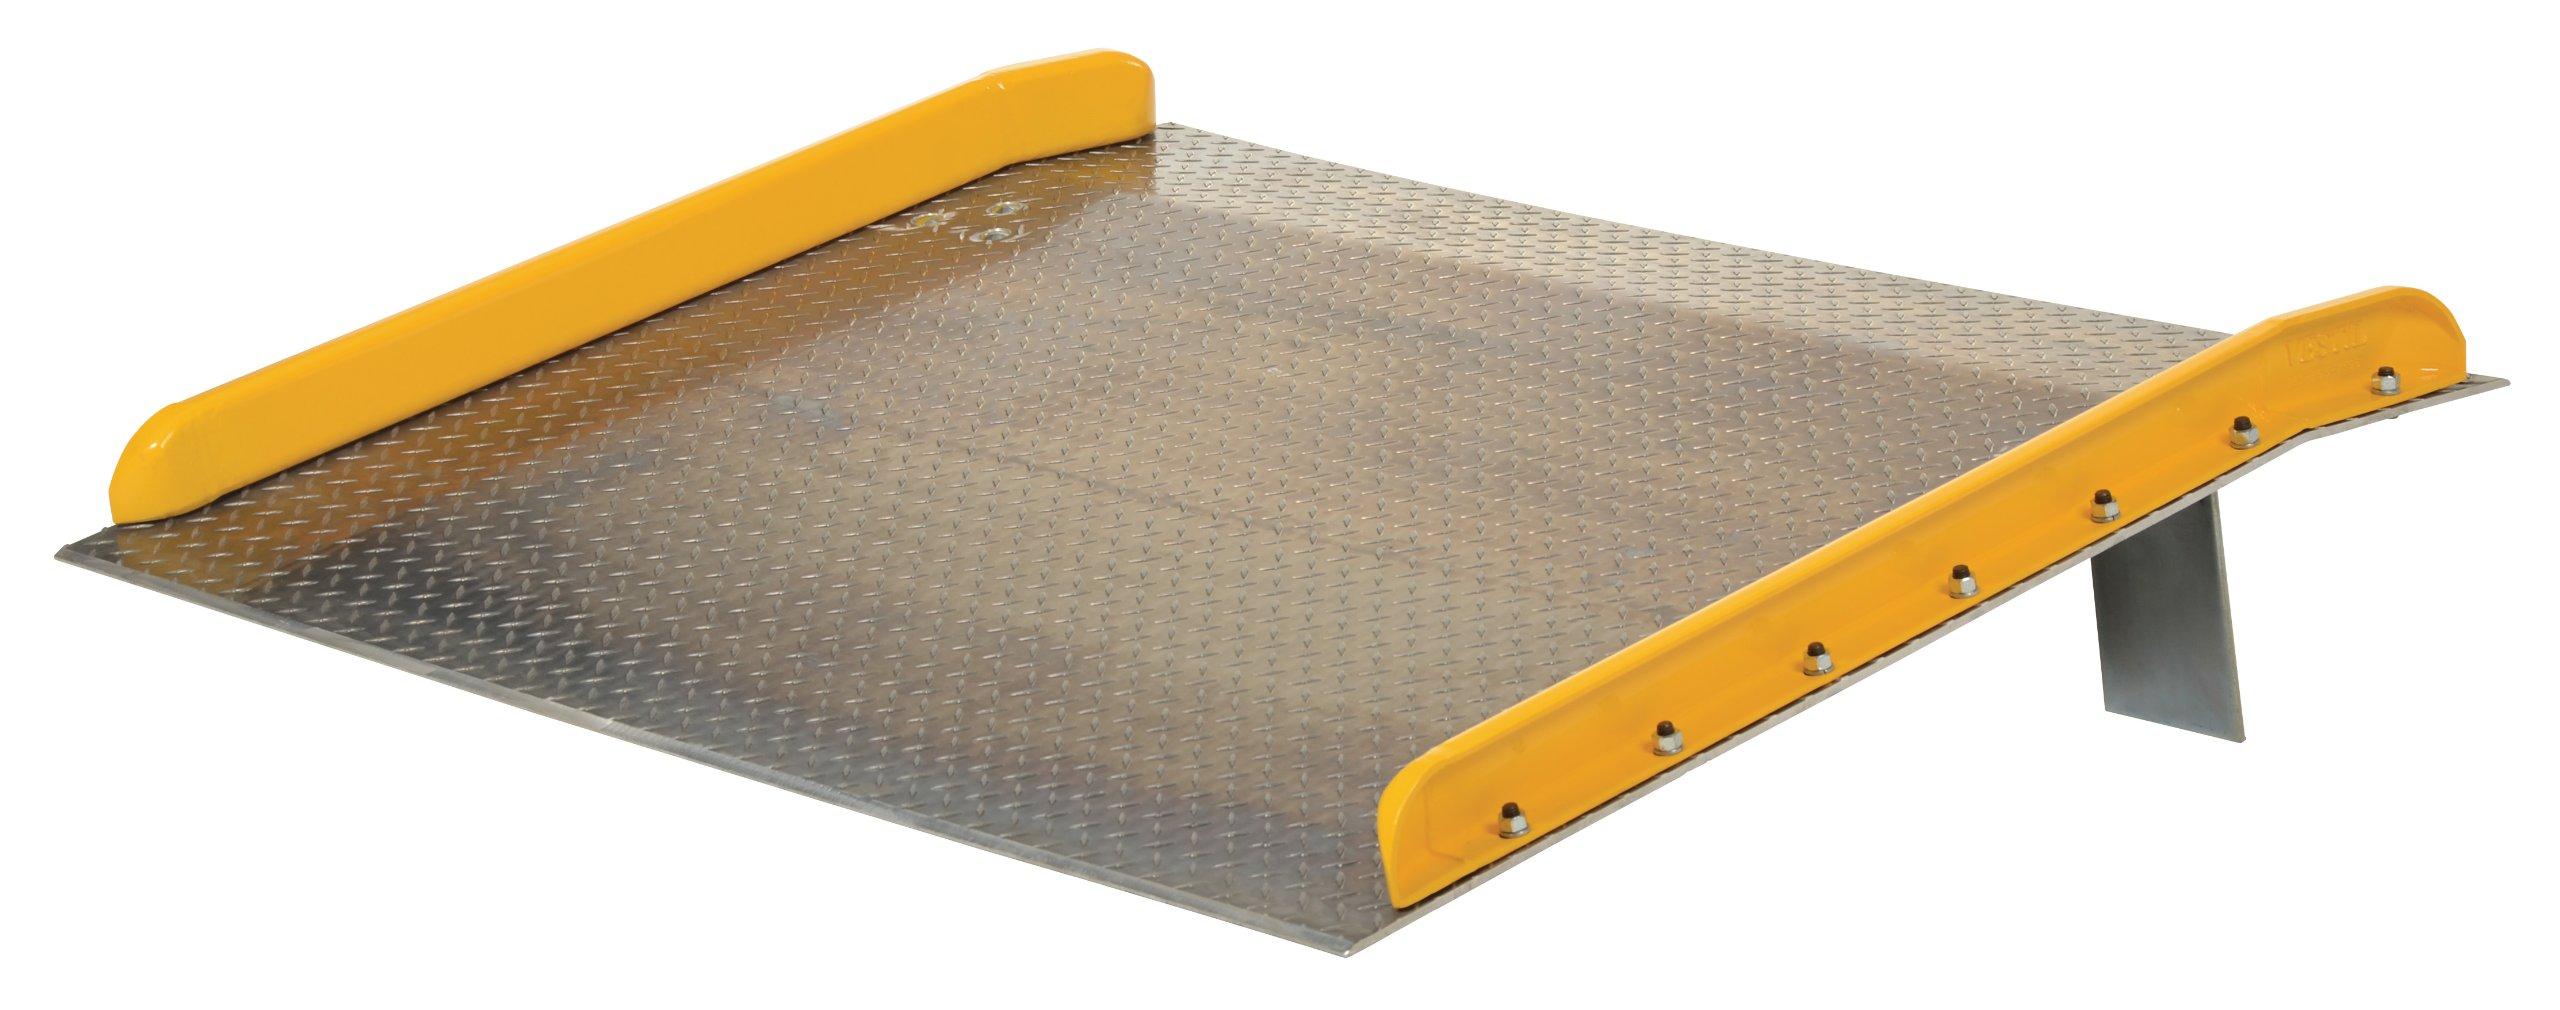 Vestil TAS-15-7236 Aluminum Dock Board with Steel Curb, 15000 lb. Capacity, 72'' x 36'', Silver